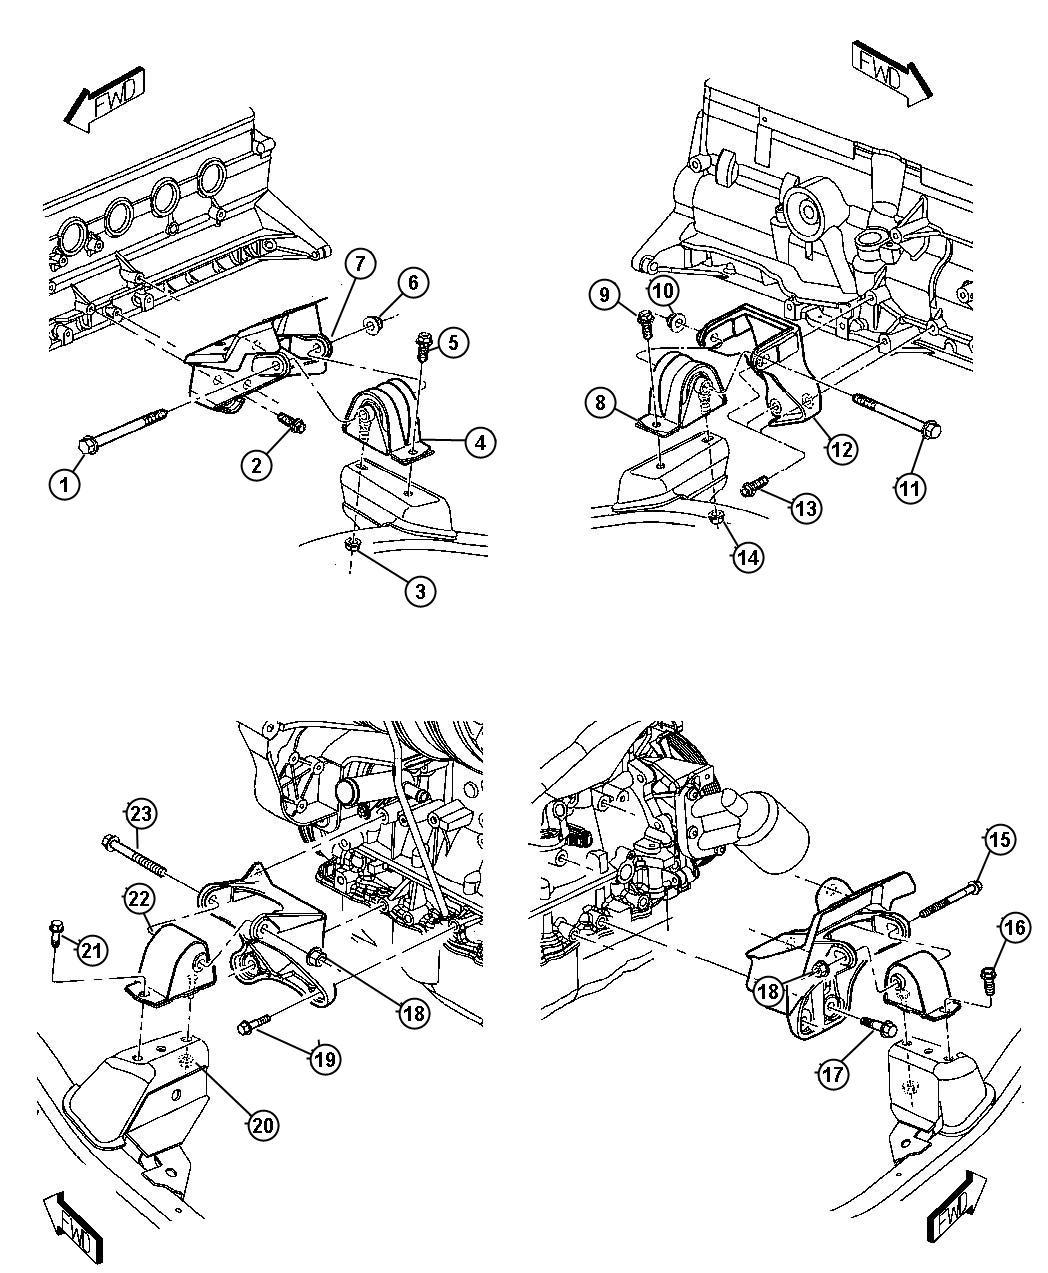 Dodge Caravan Insulator Engine Mount Used For